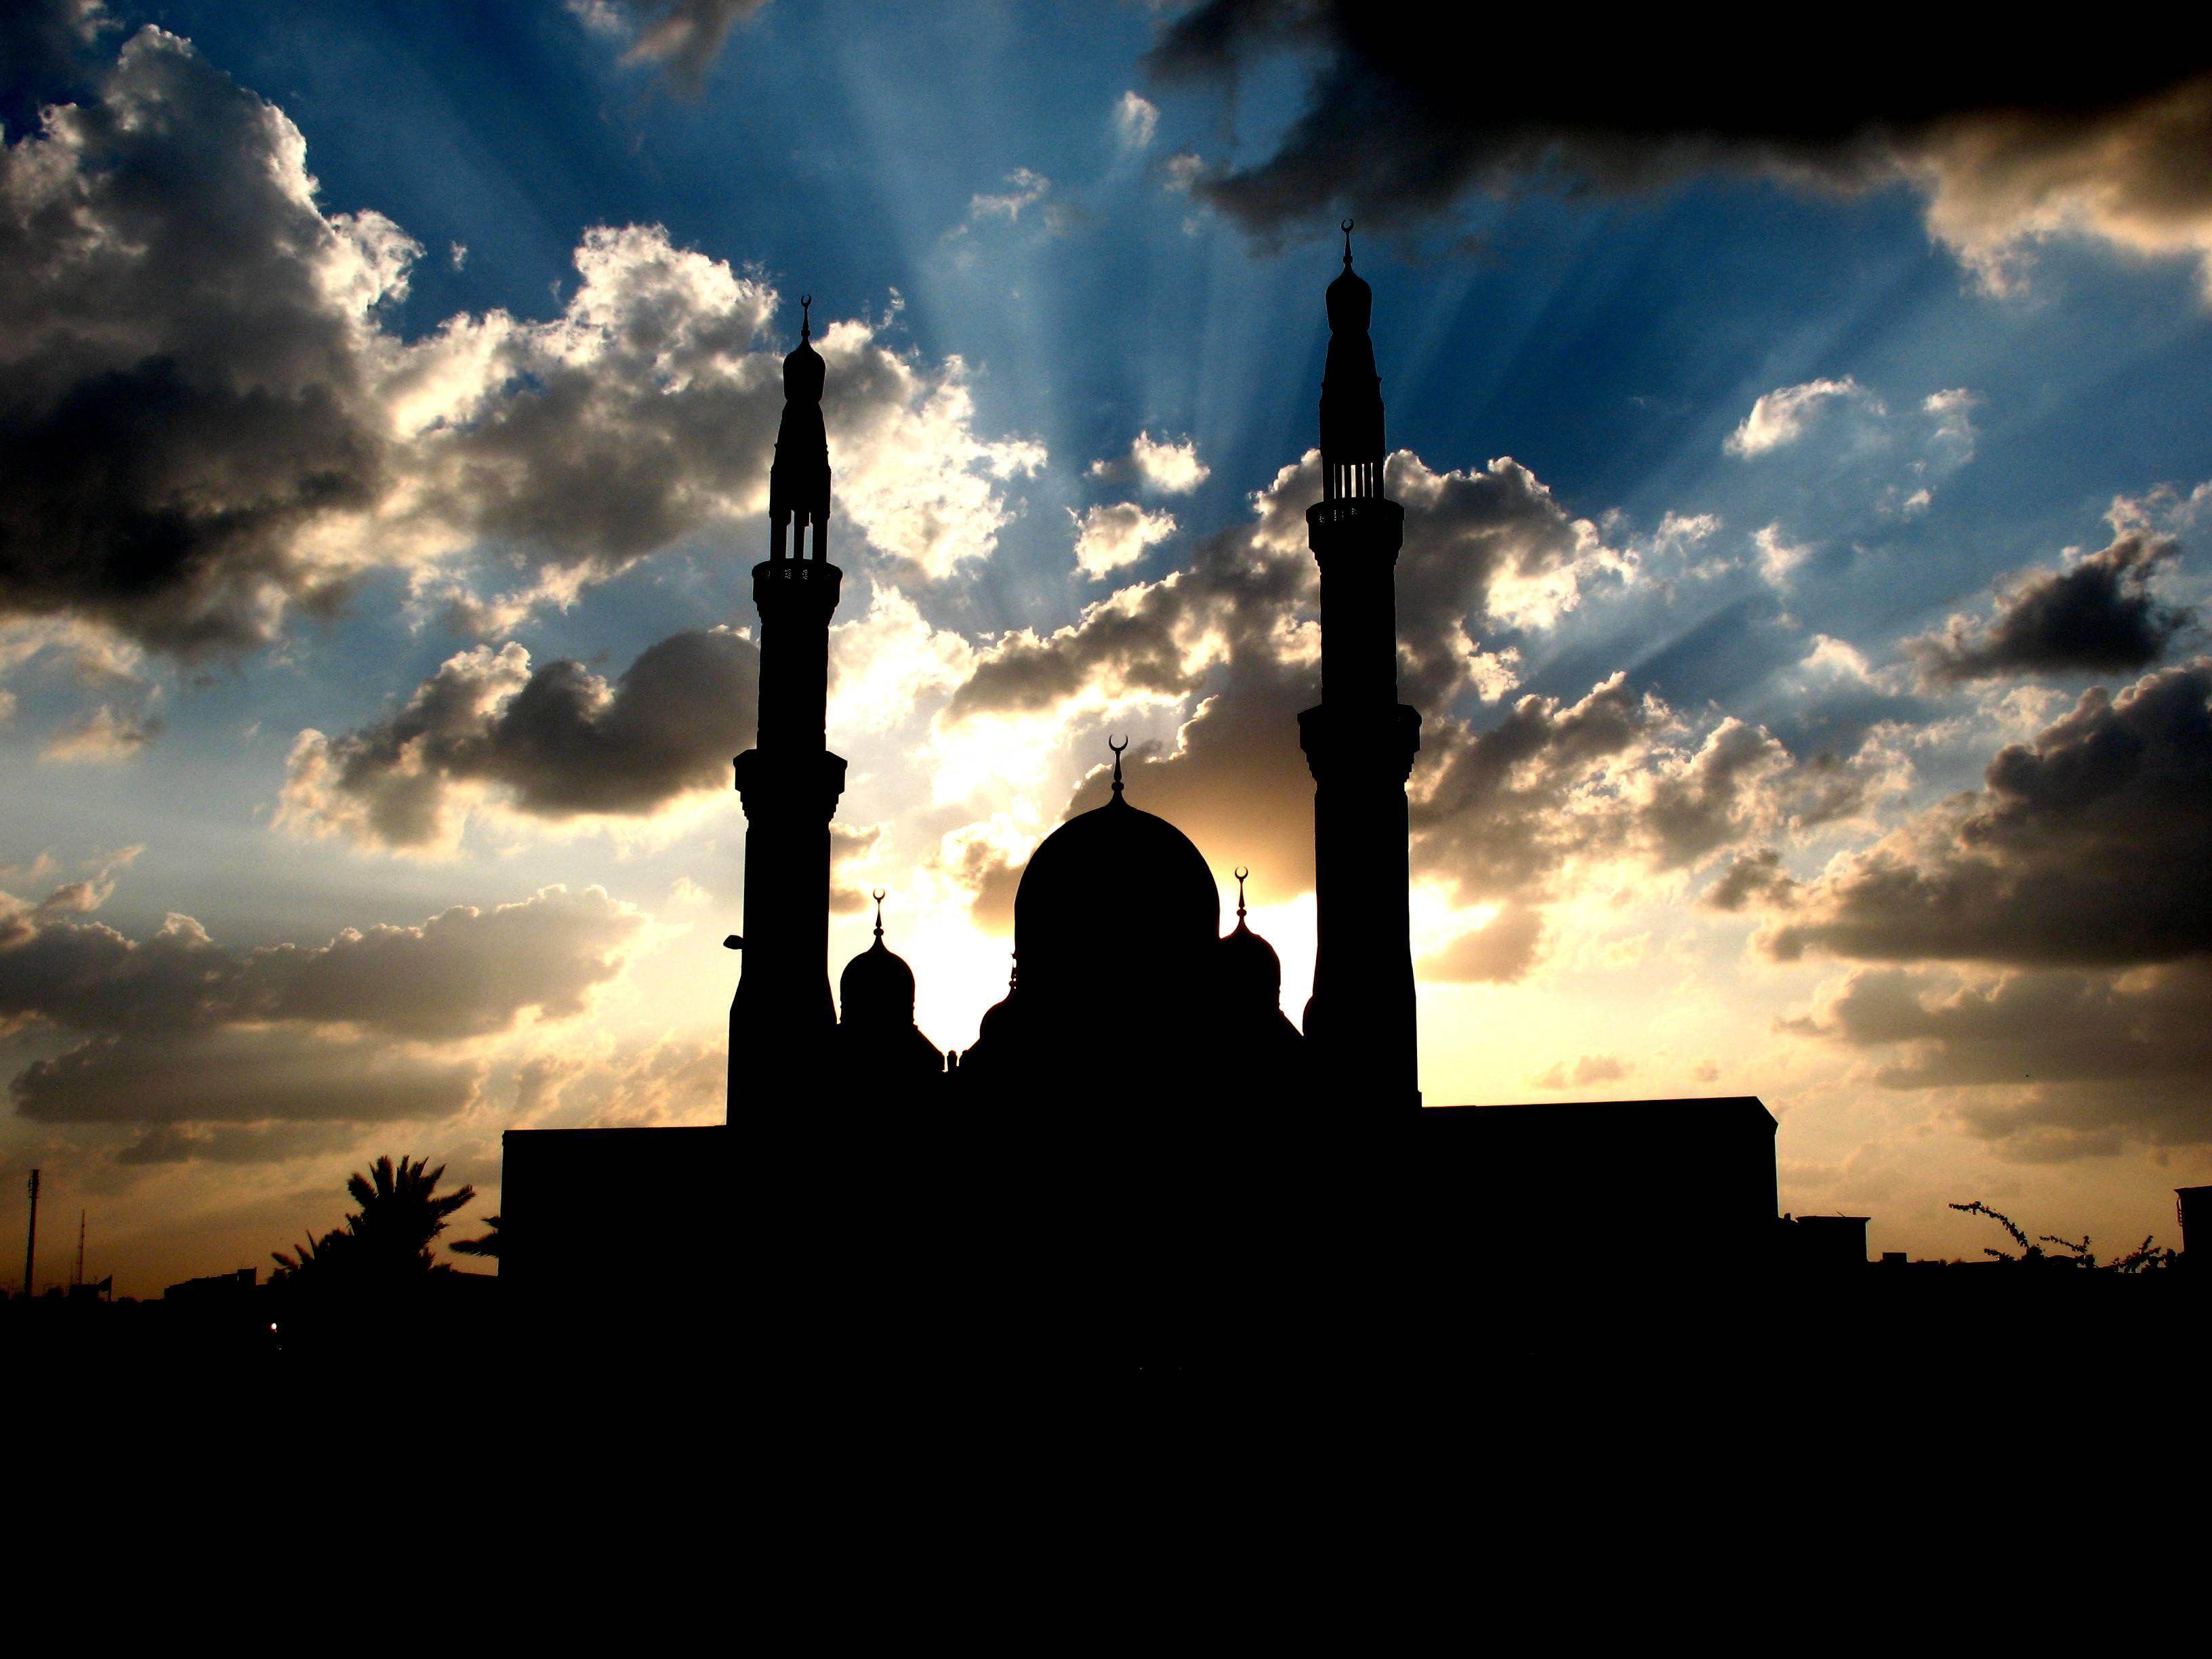 Clouds Mosque Wallpaper